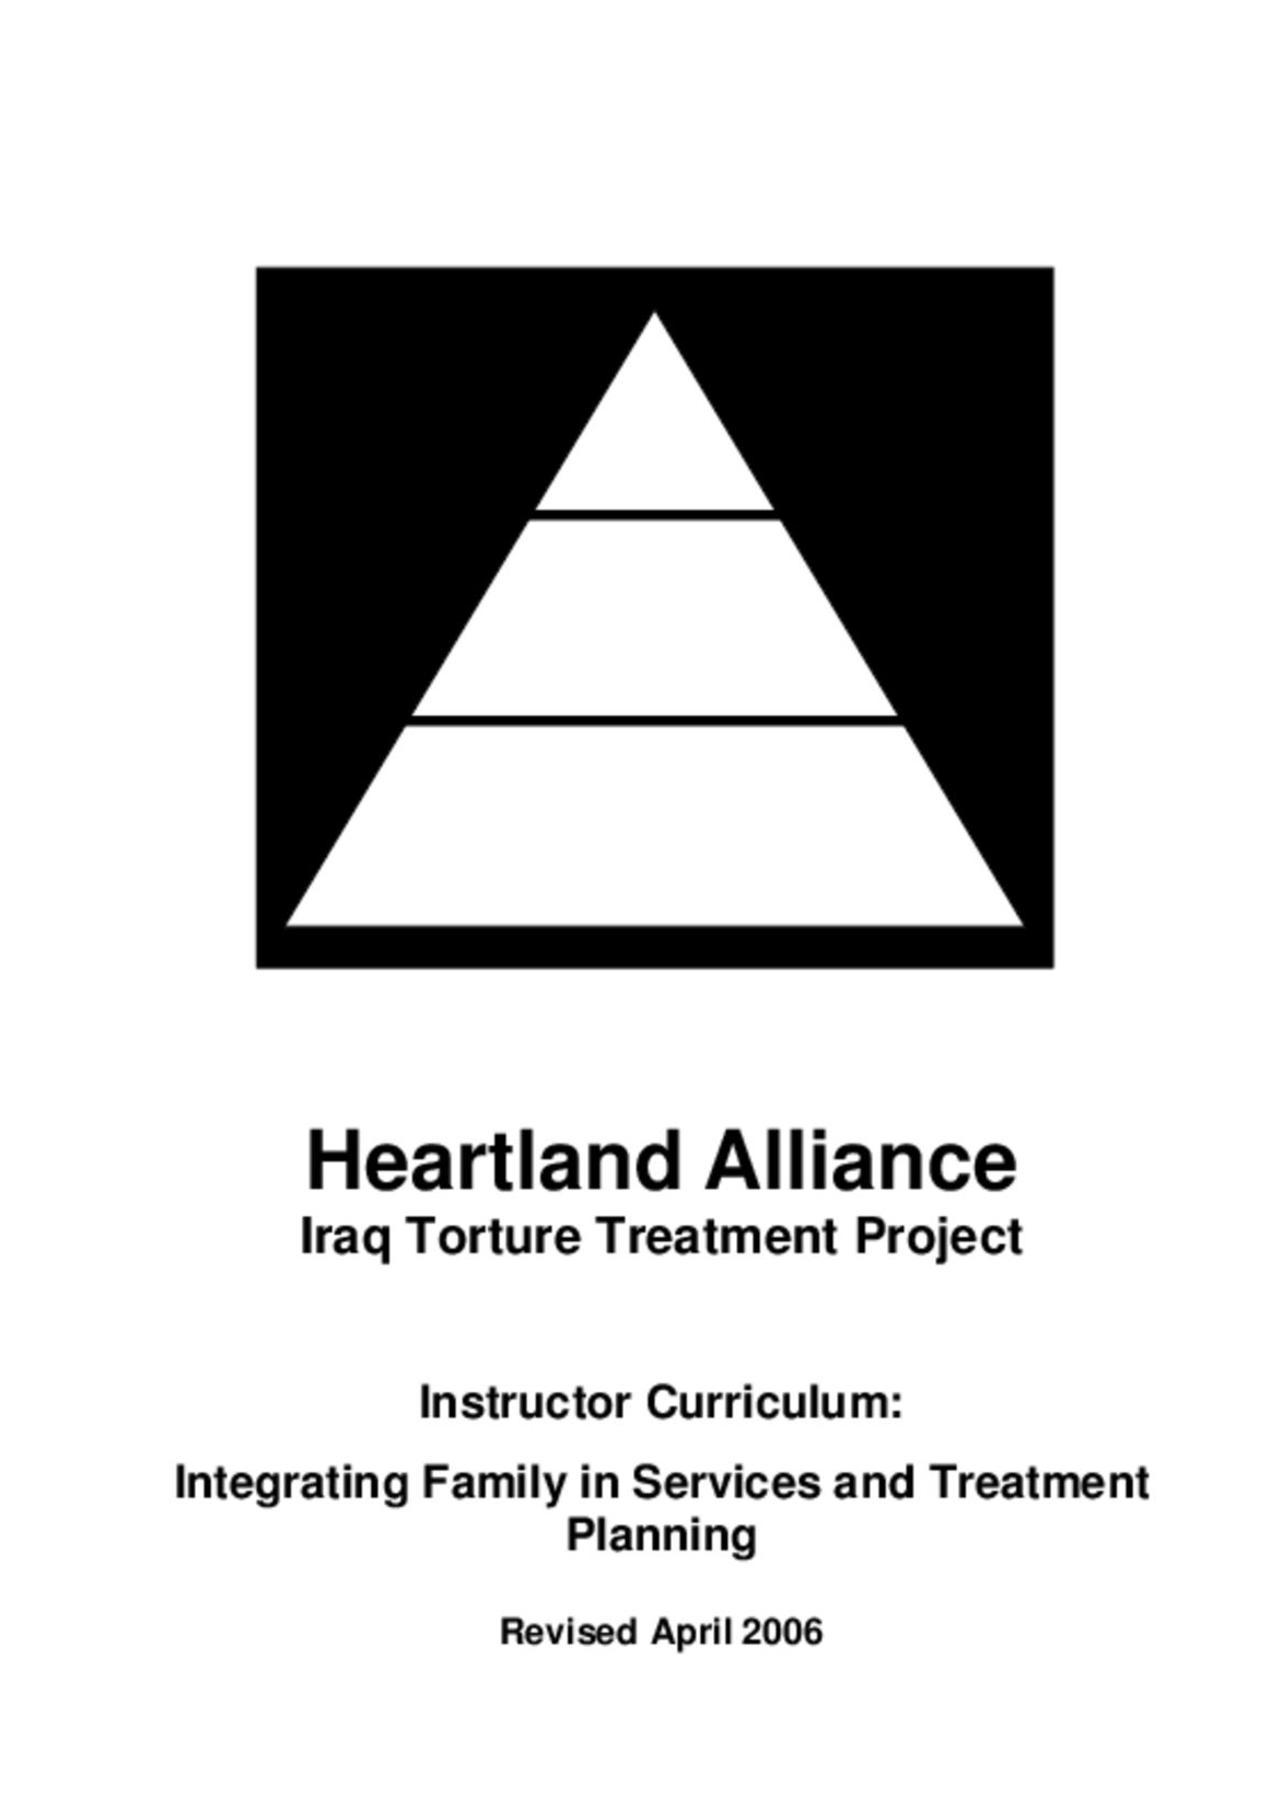 ُمنهجِ التدريب عمليى لتَطوير وتَحسين مهاراتِ المتخصصين فى مجال الصحة النفسية، جزء الرابع للمتدربين